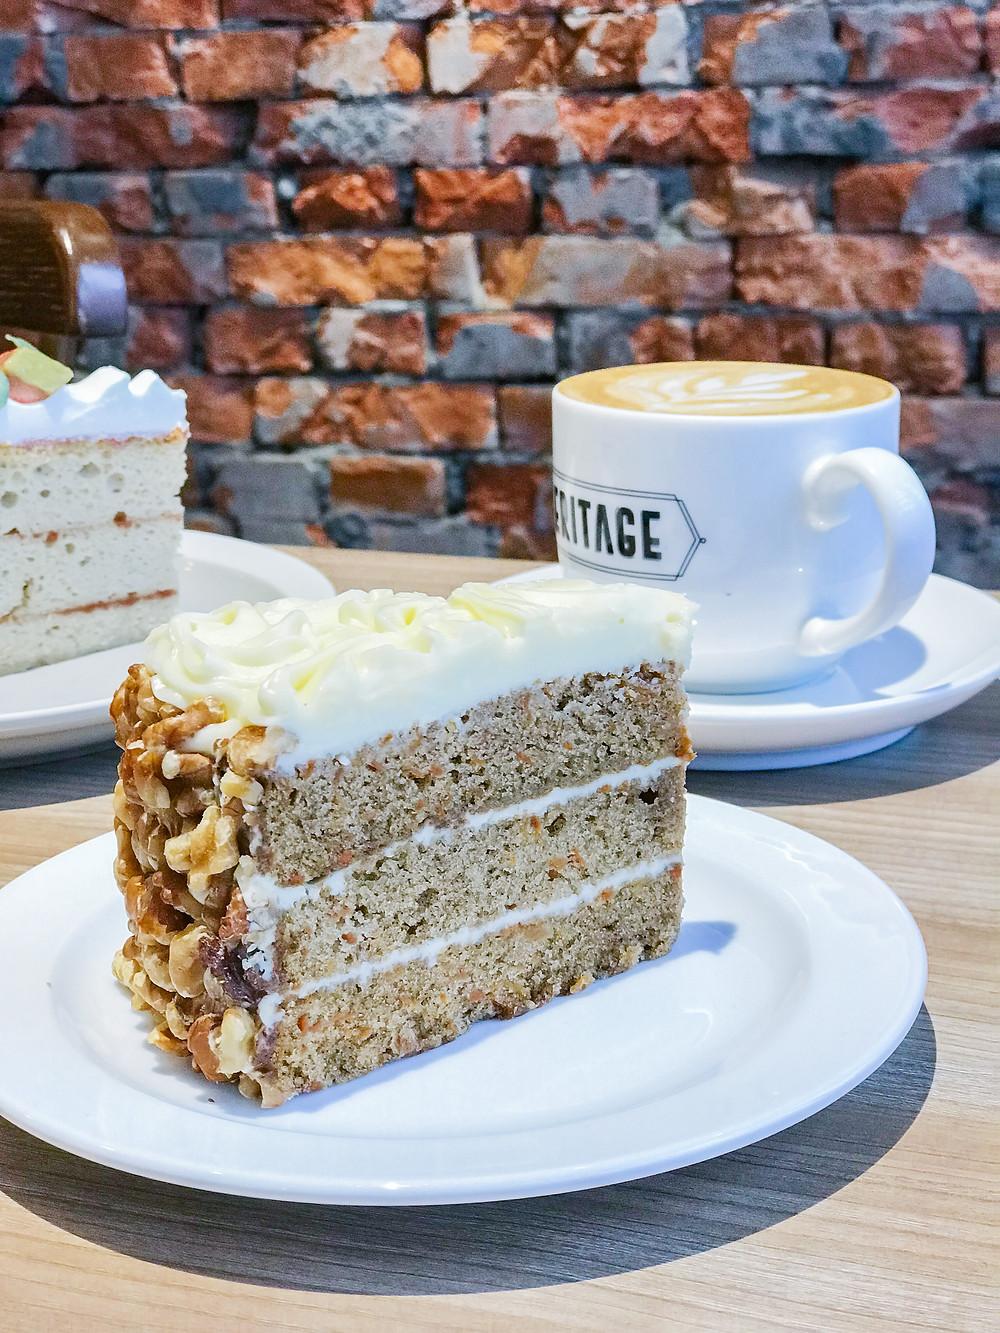 Heritage Cafe & Bakery | Taipei | A Style Alike